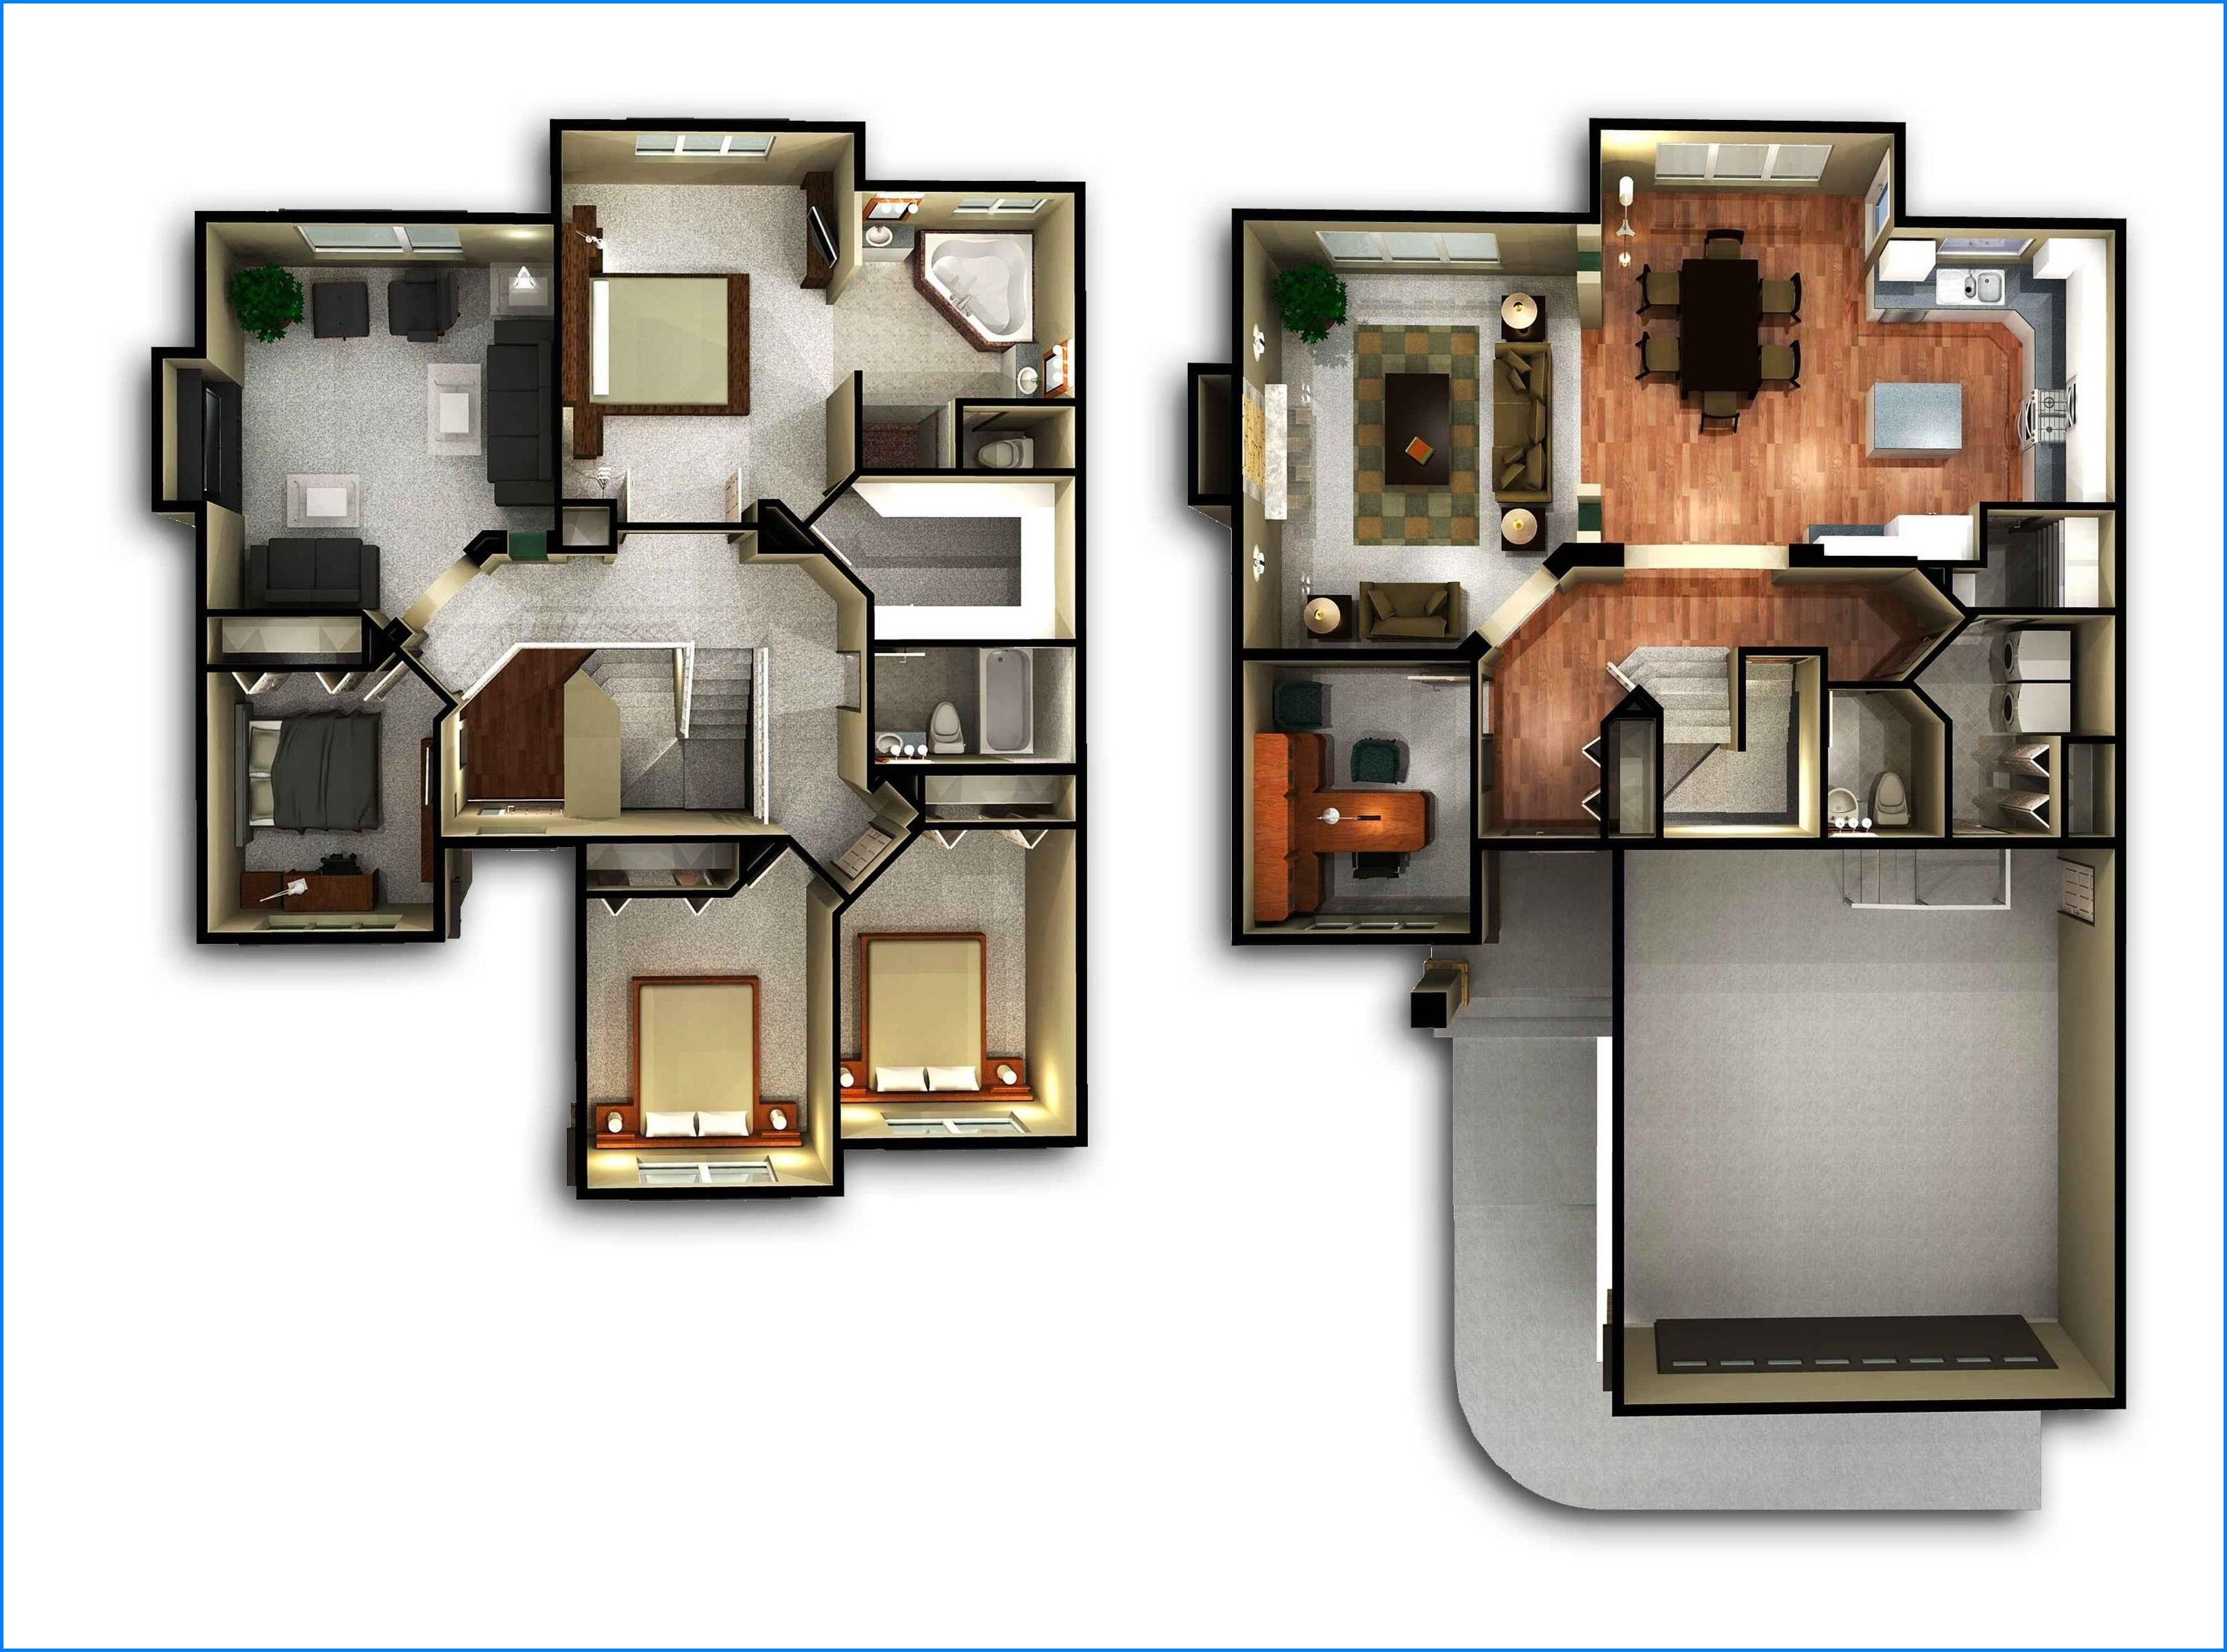 Denah Rumah Sederhana 2 Lantai Minimalis Ukuran Kecil 3d Denah Lantai Rumah Denah Rumah Desain Rumah